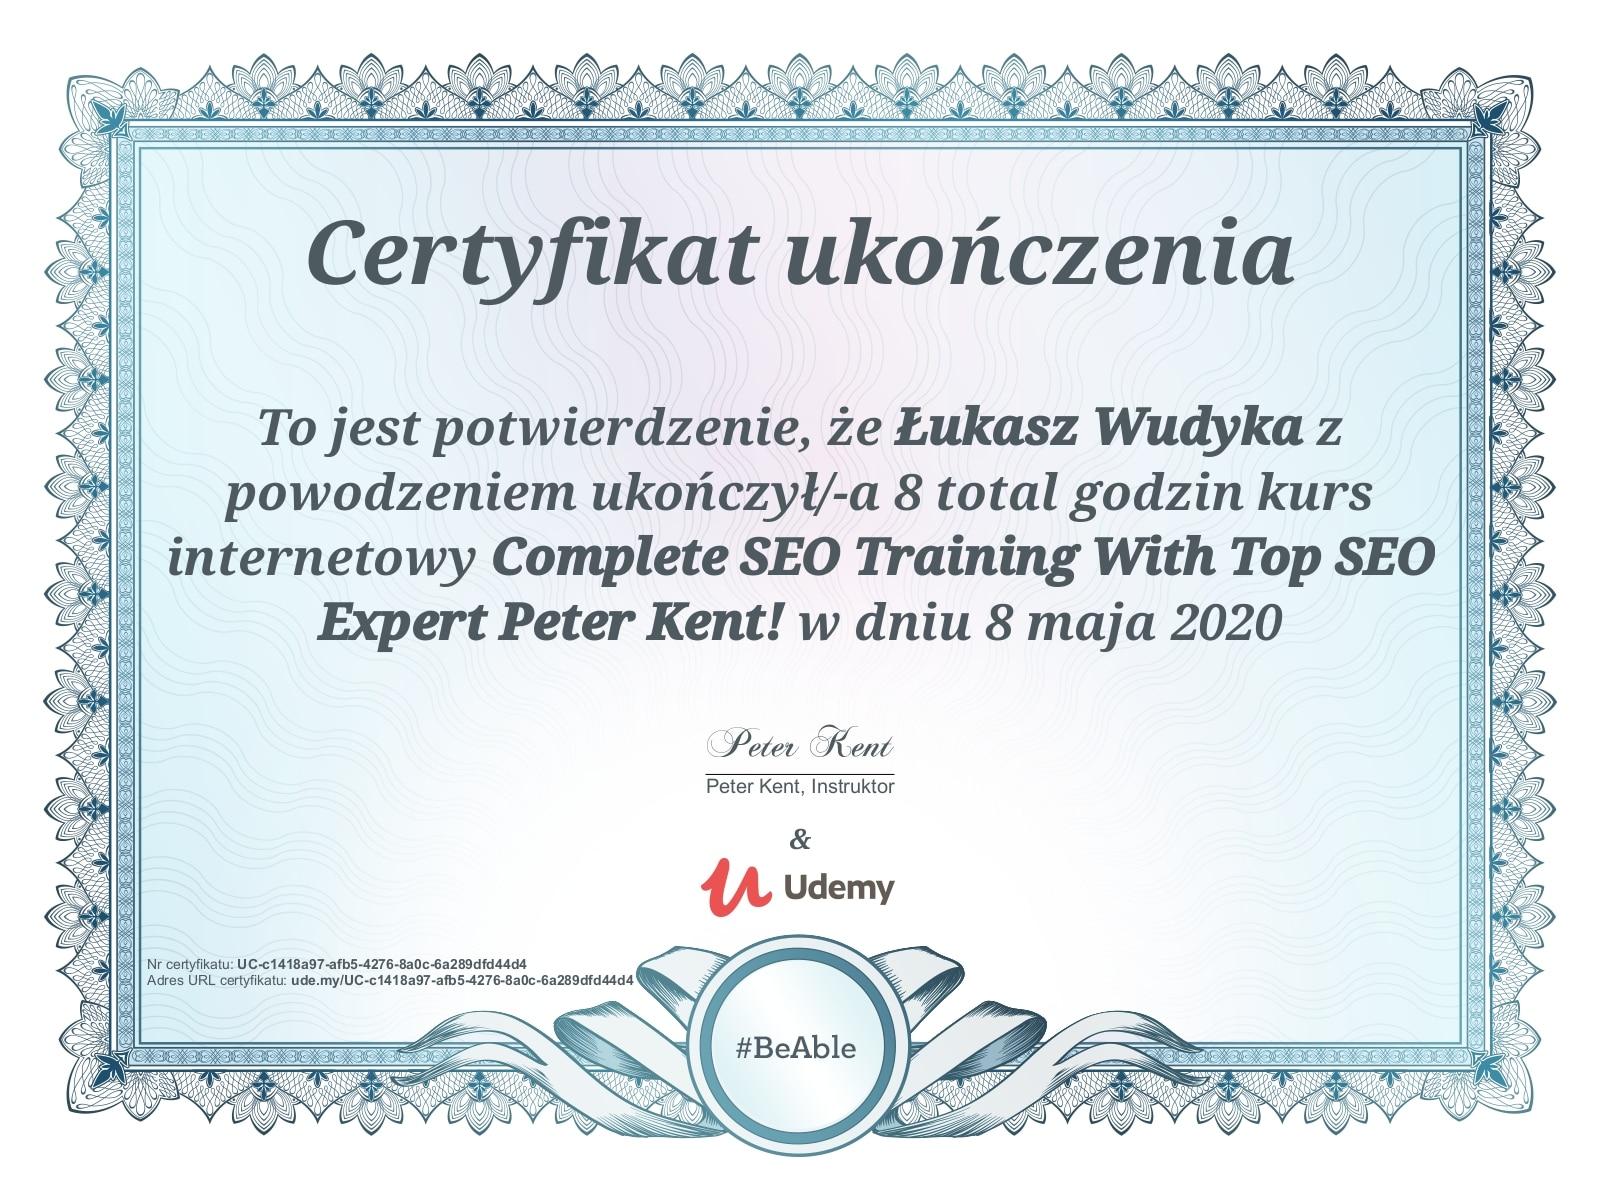 Łukasz Wudyka certyfikat UDEMY - Complete SEO Traning With Top SEO Expert Peter Kent